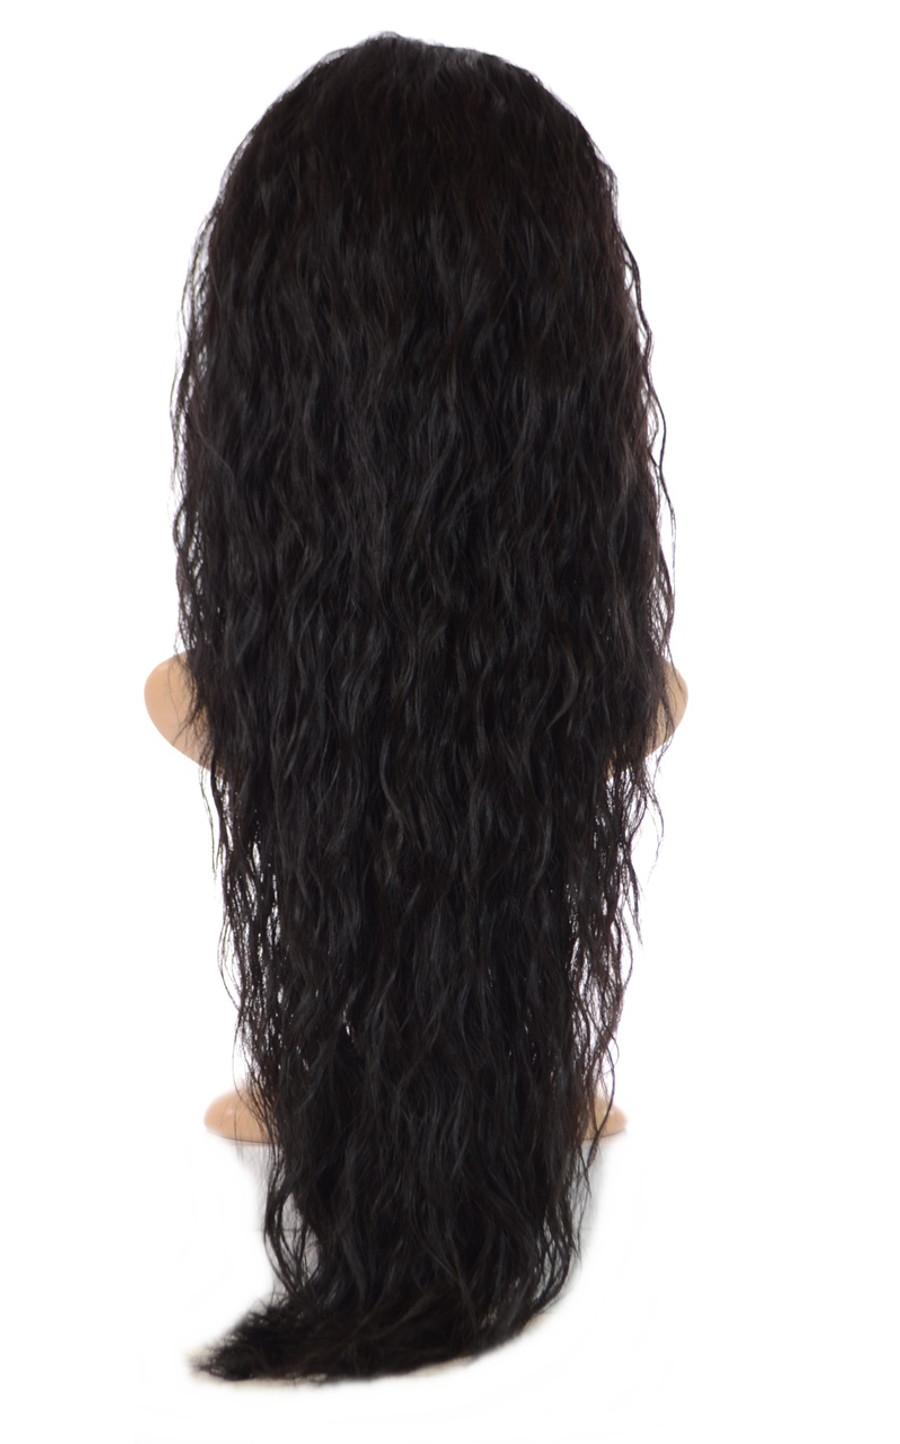 V Tress Crimp Texture One Weft Half Wig Expresso Black